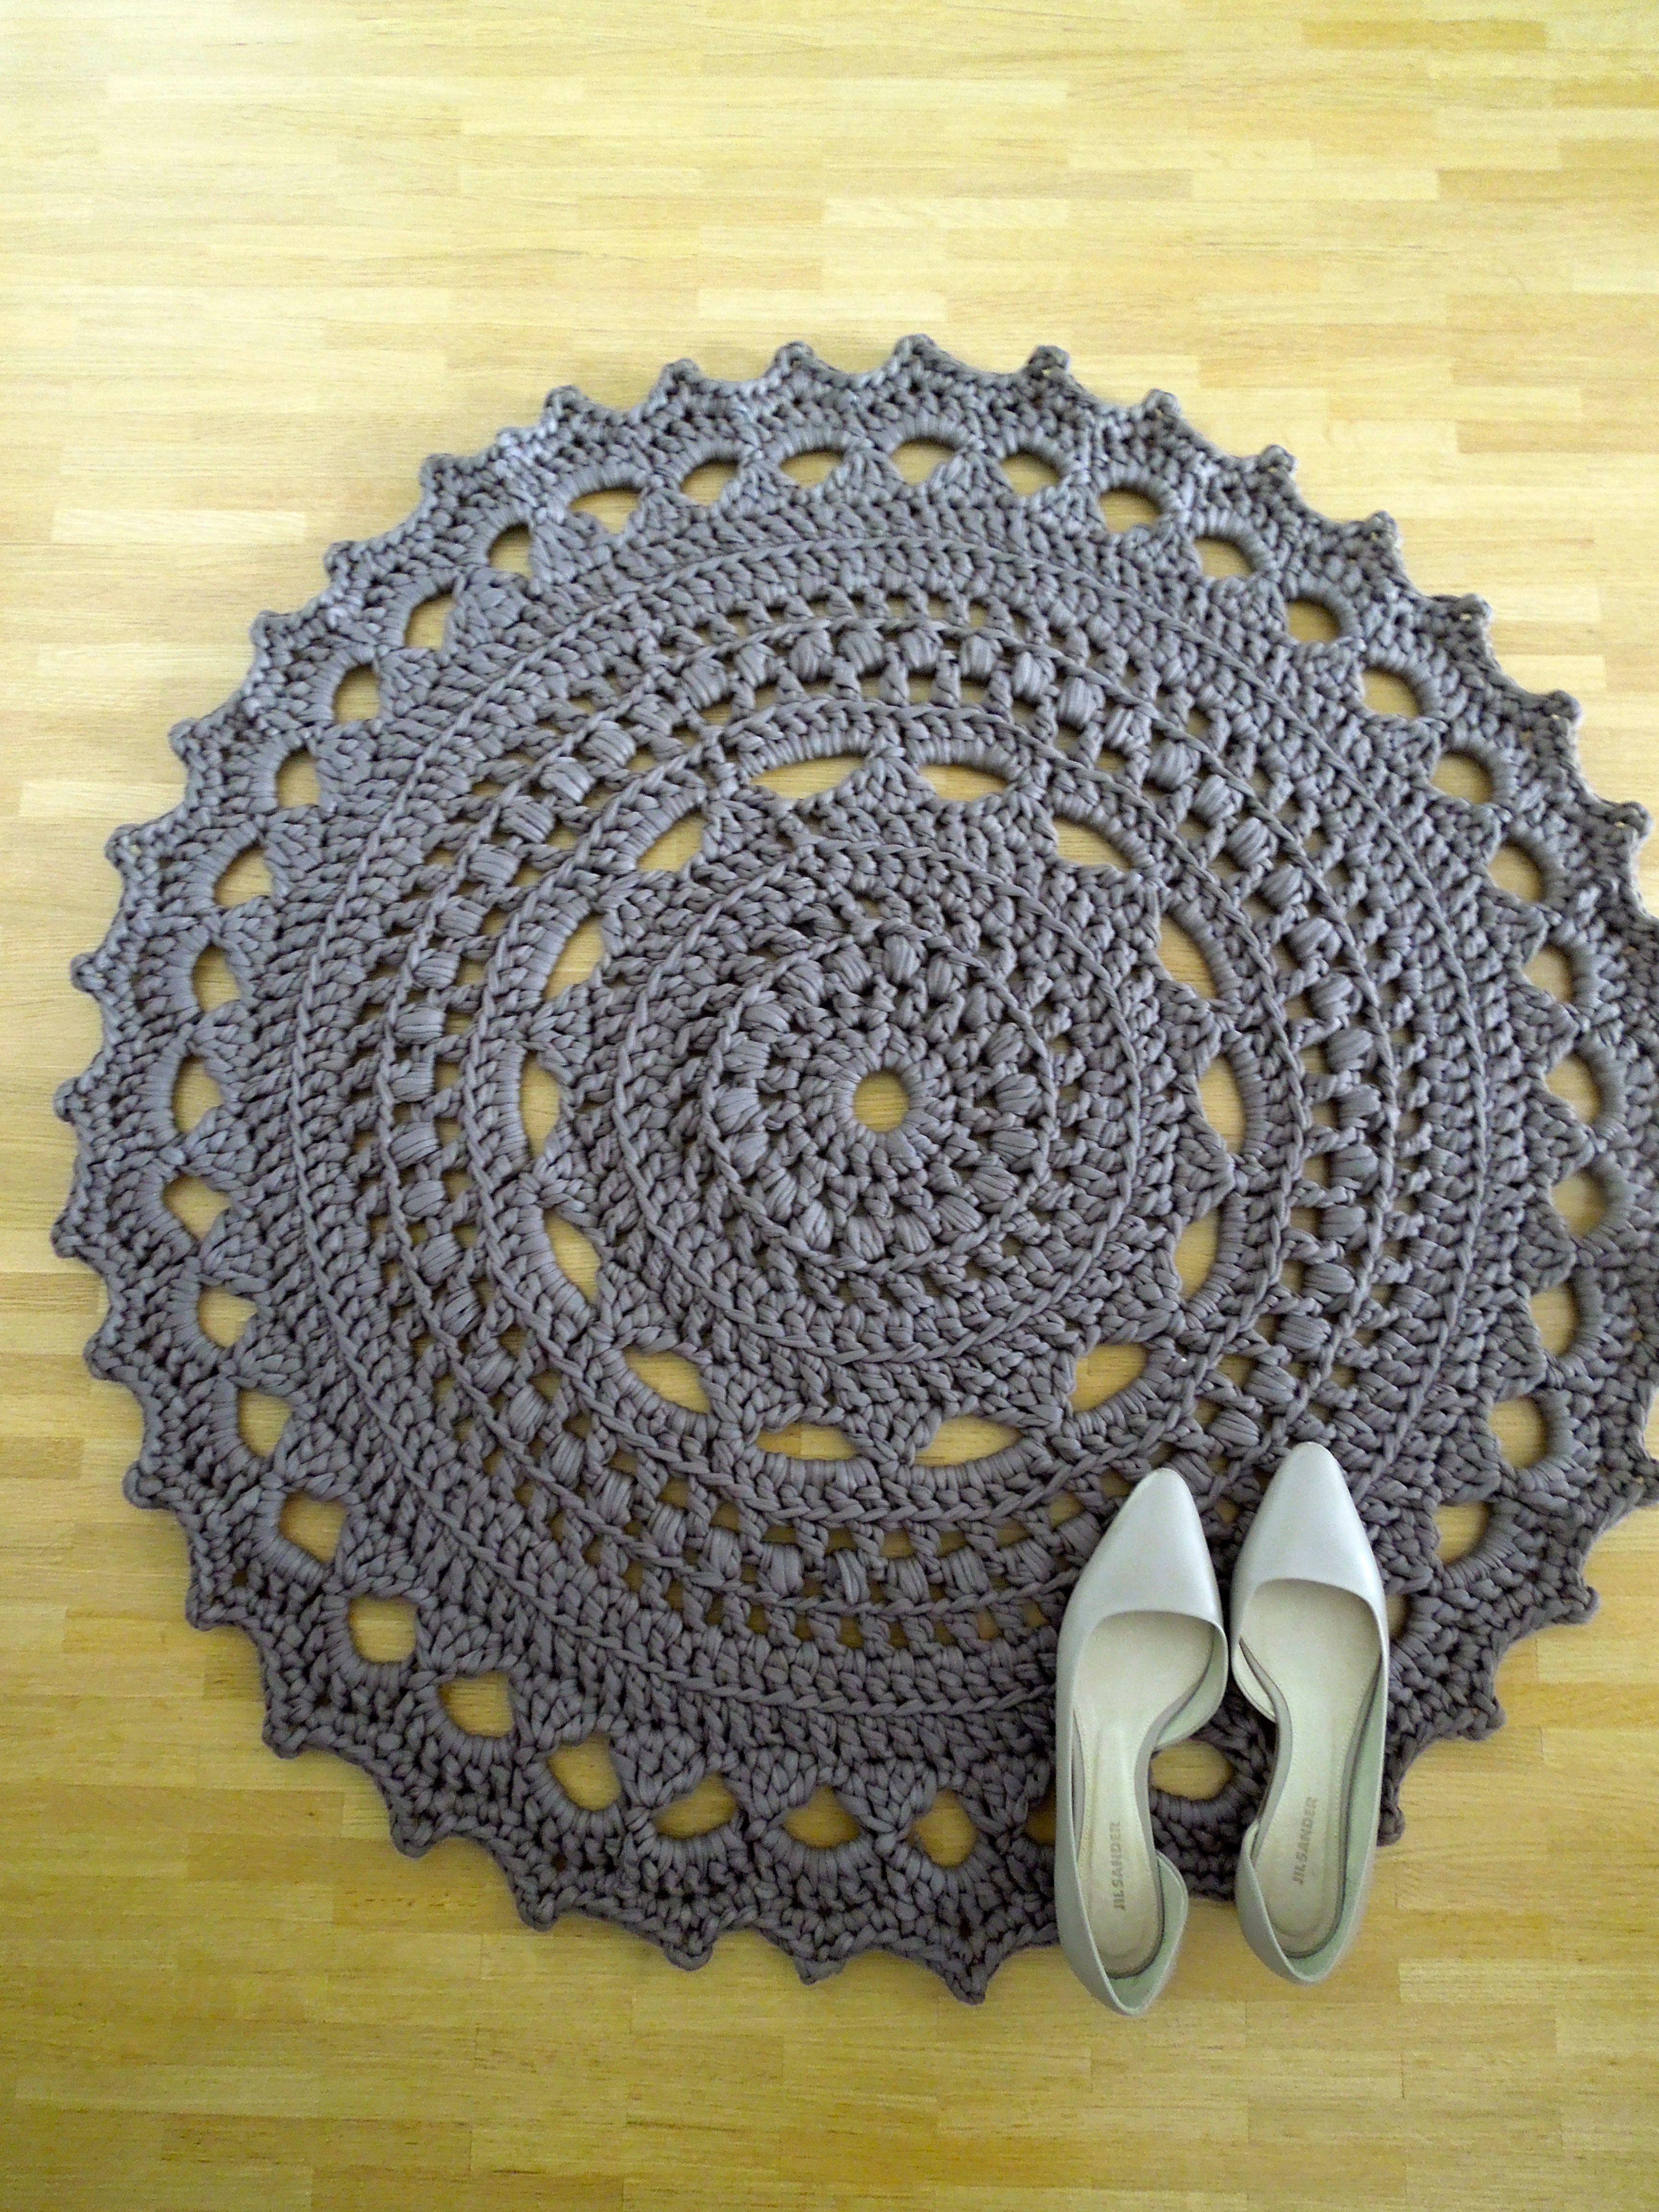 crochet rug אין הוראות הכנה | Crochet DIY | Pinterest | Diagramm ...